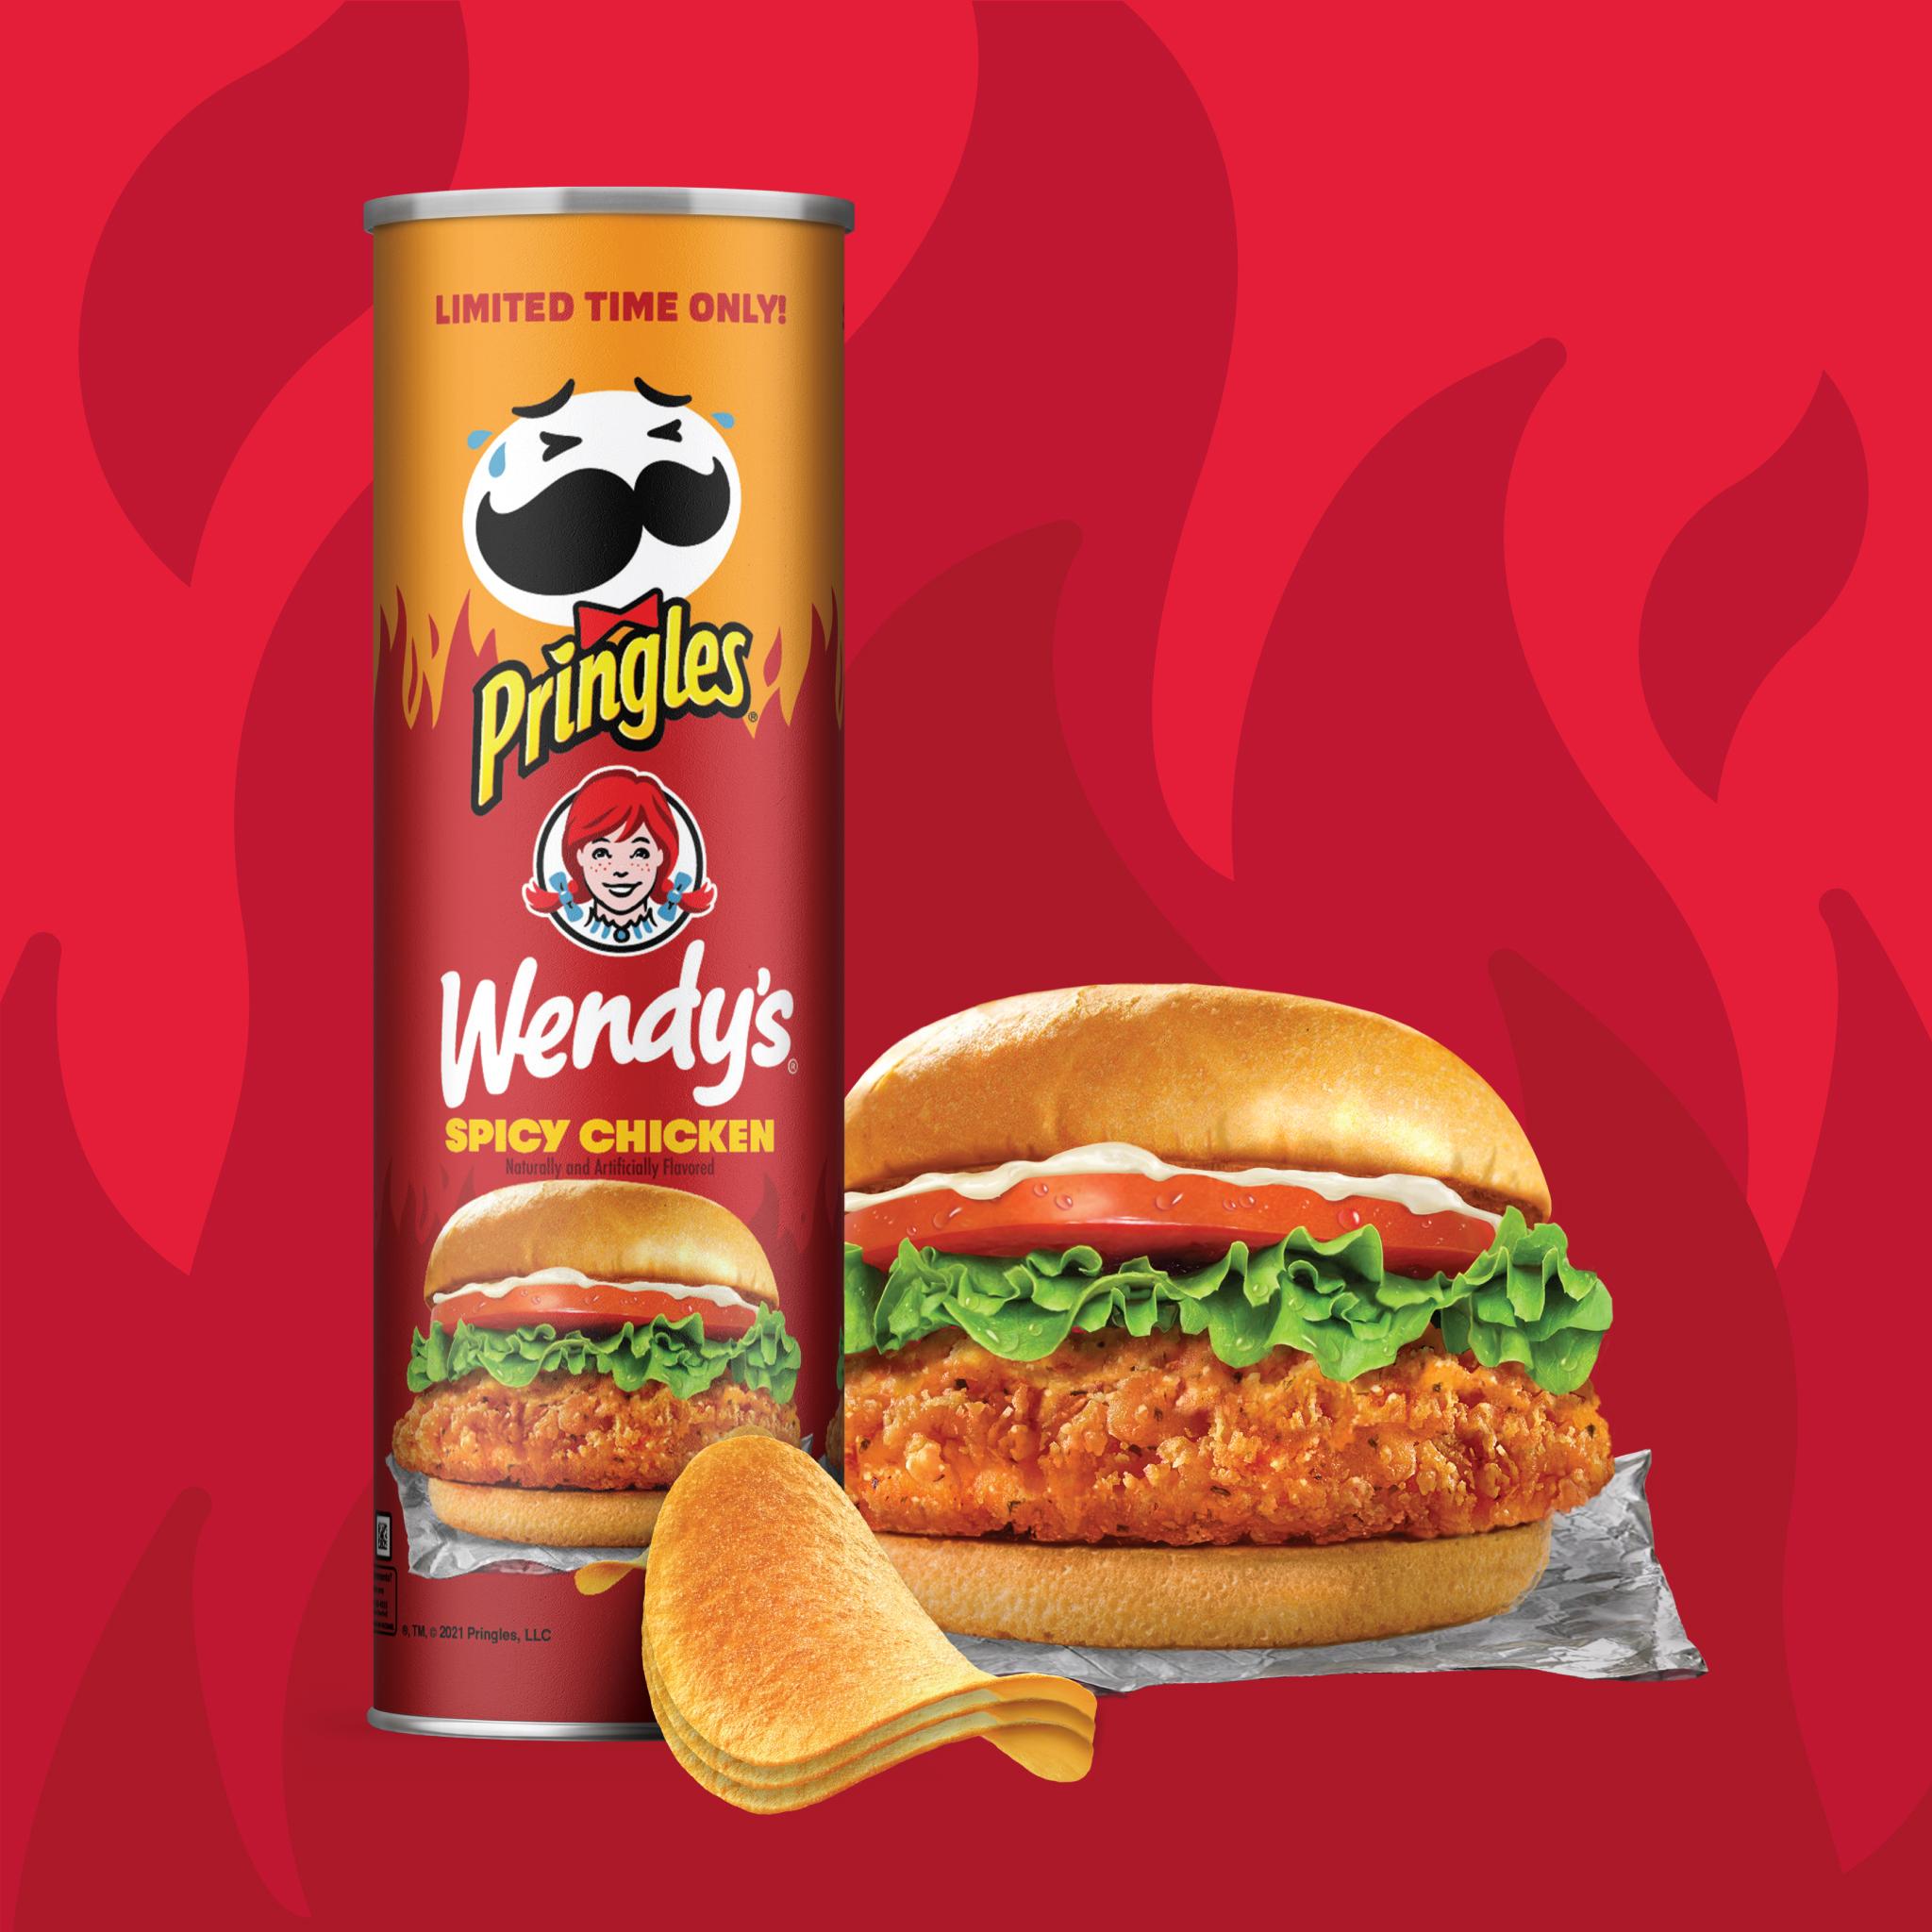 (Courtesy: Pringles / Wendy's)